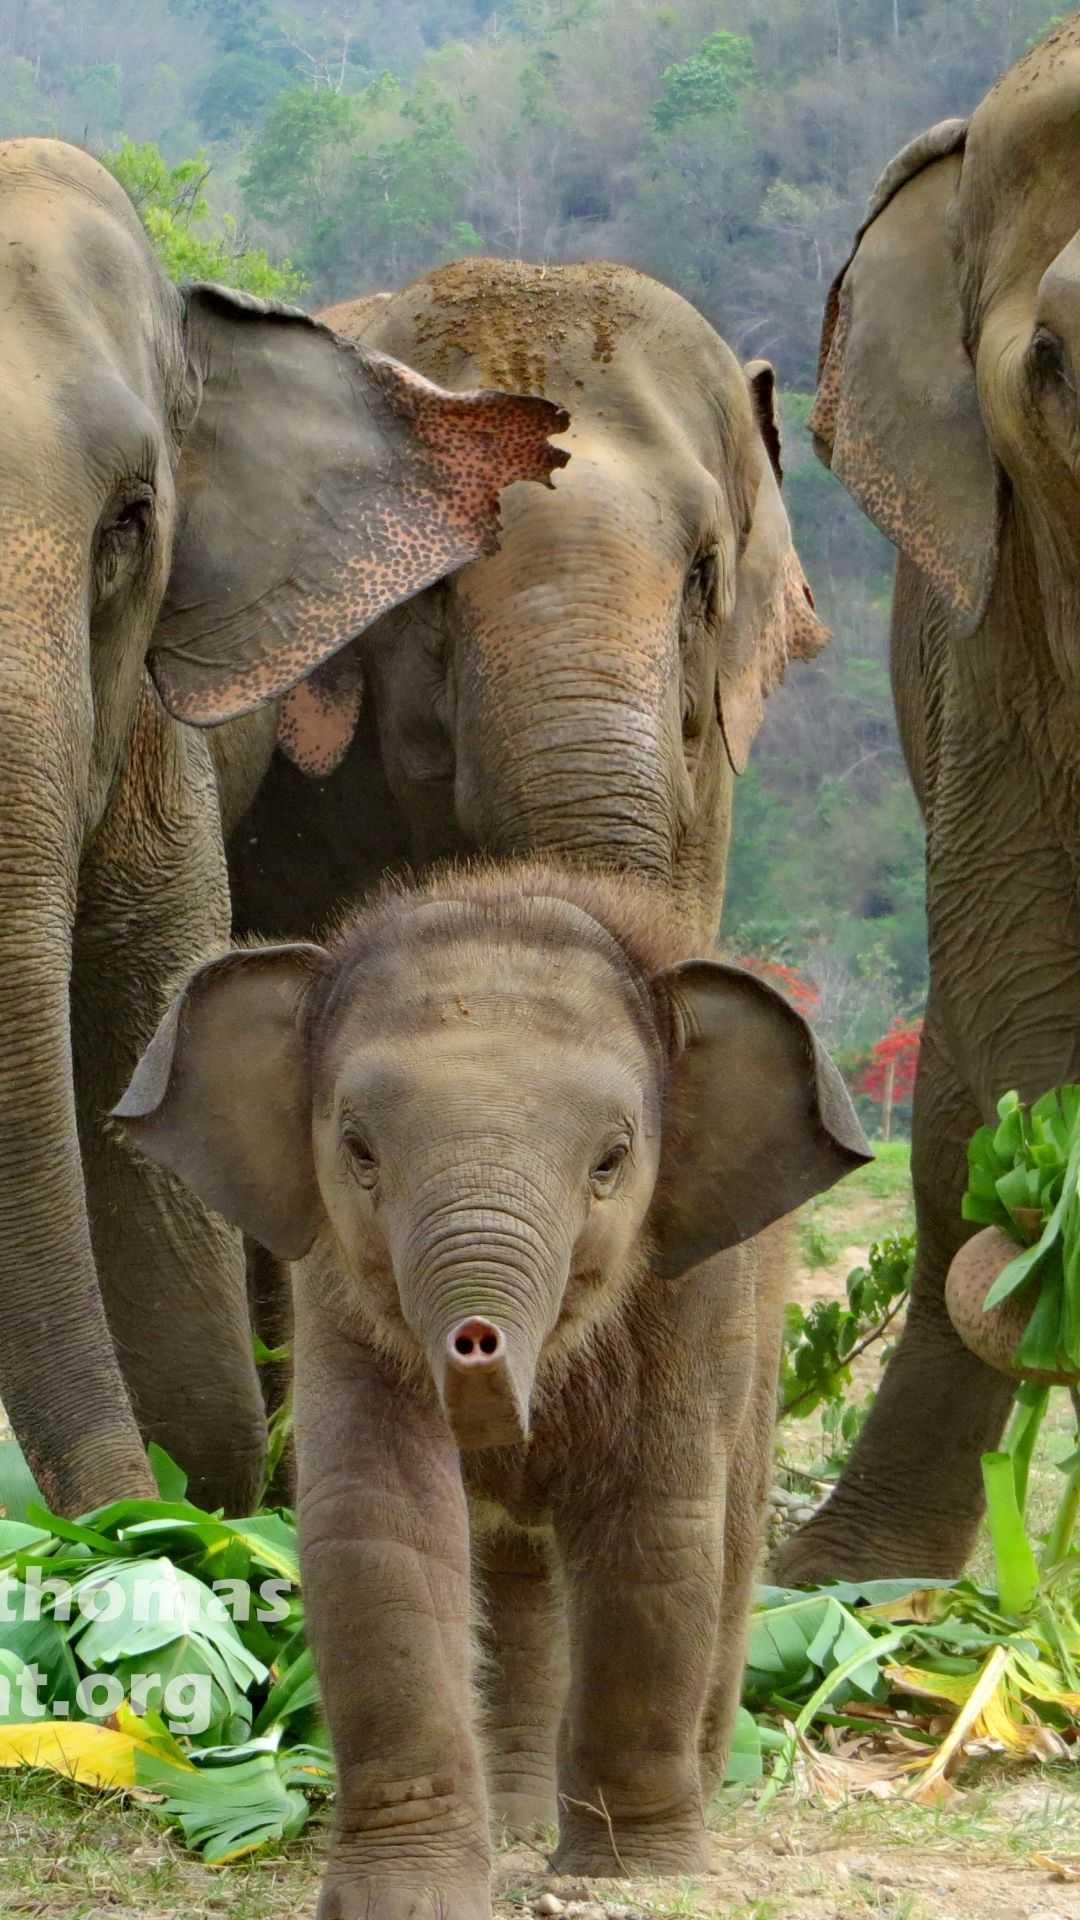 iphone baby elephant wallpaper